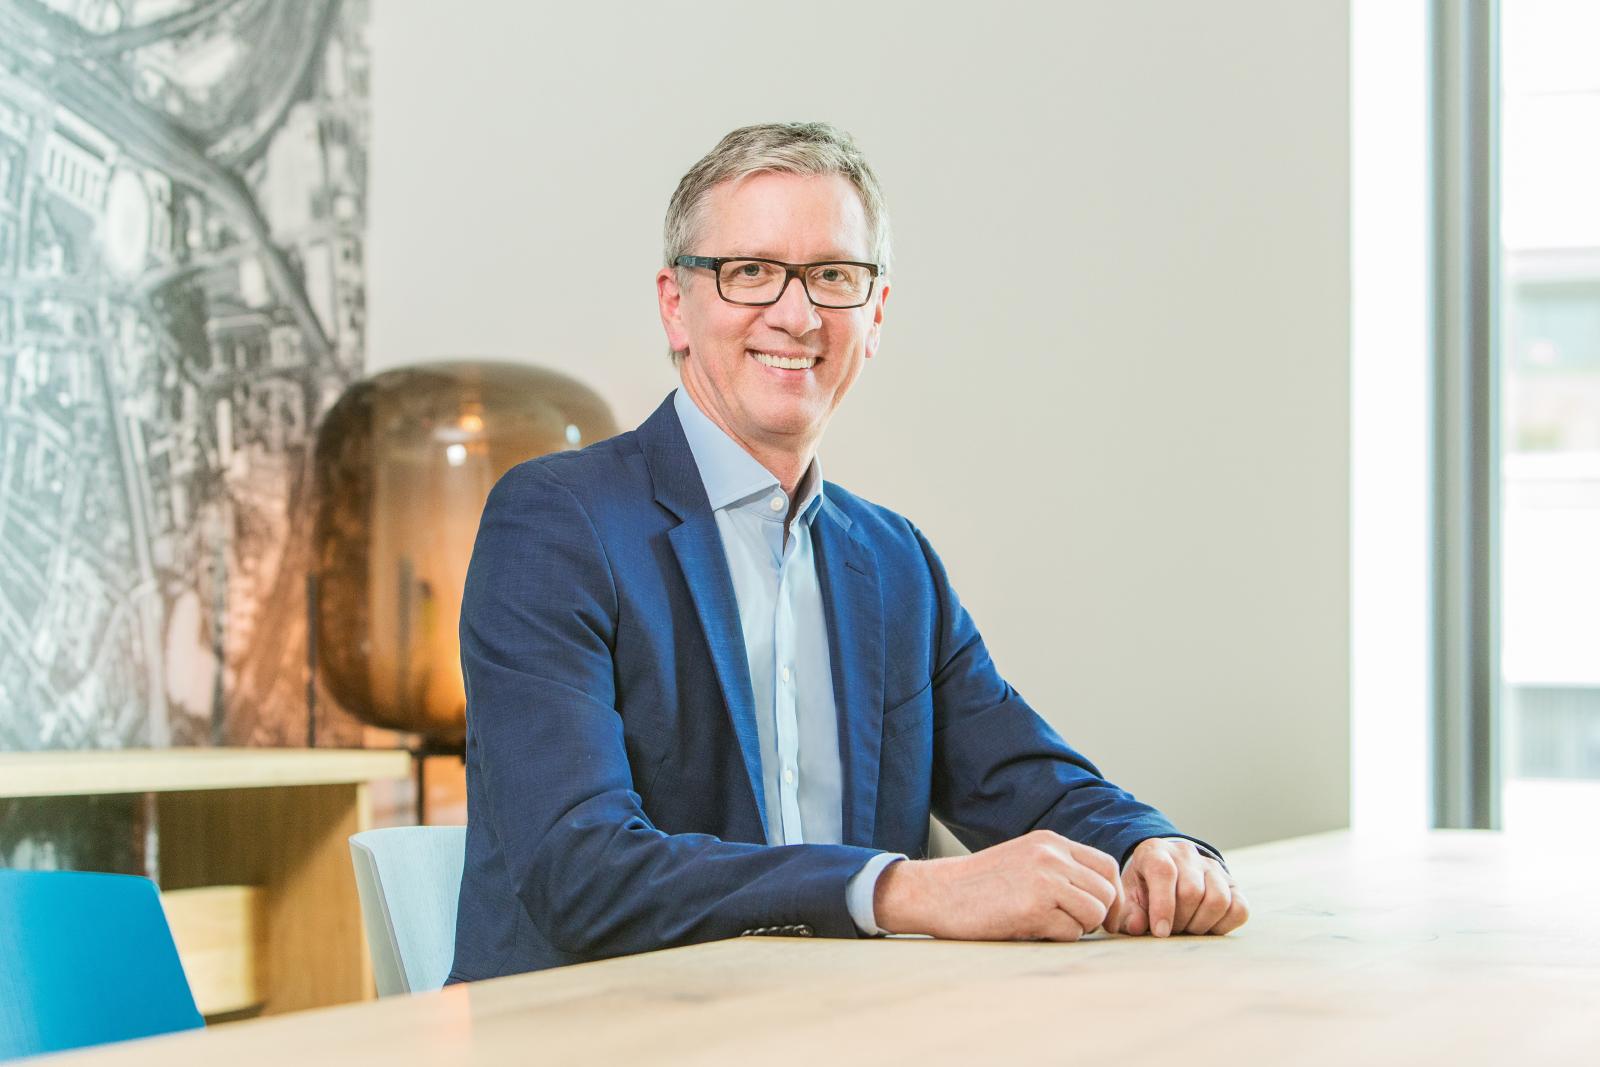 04 schneider executives consulting firma businessportraits - Consulting Fotografie im Design Office